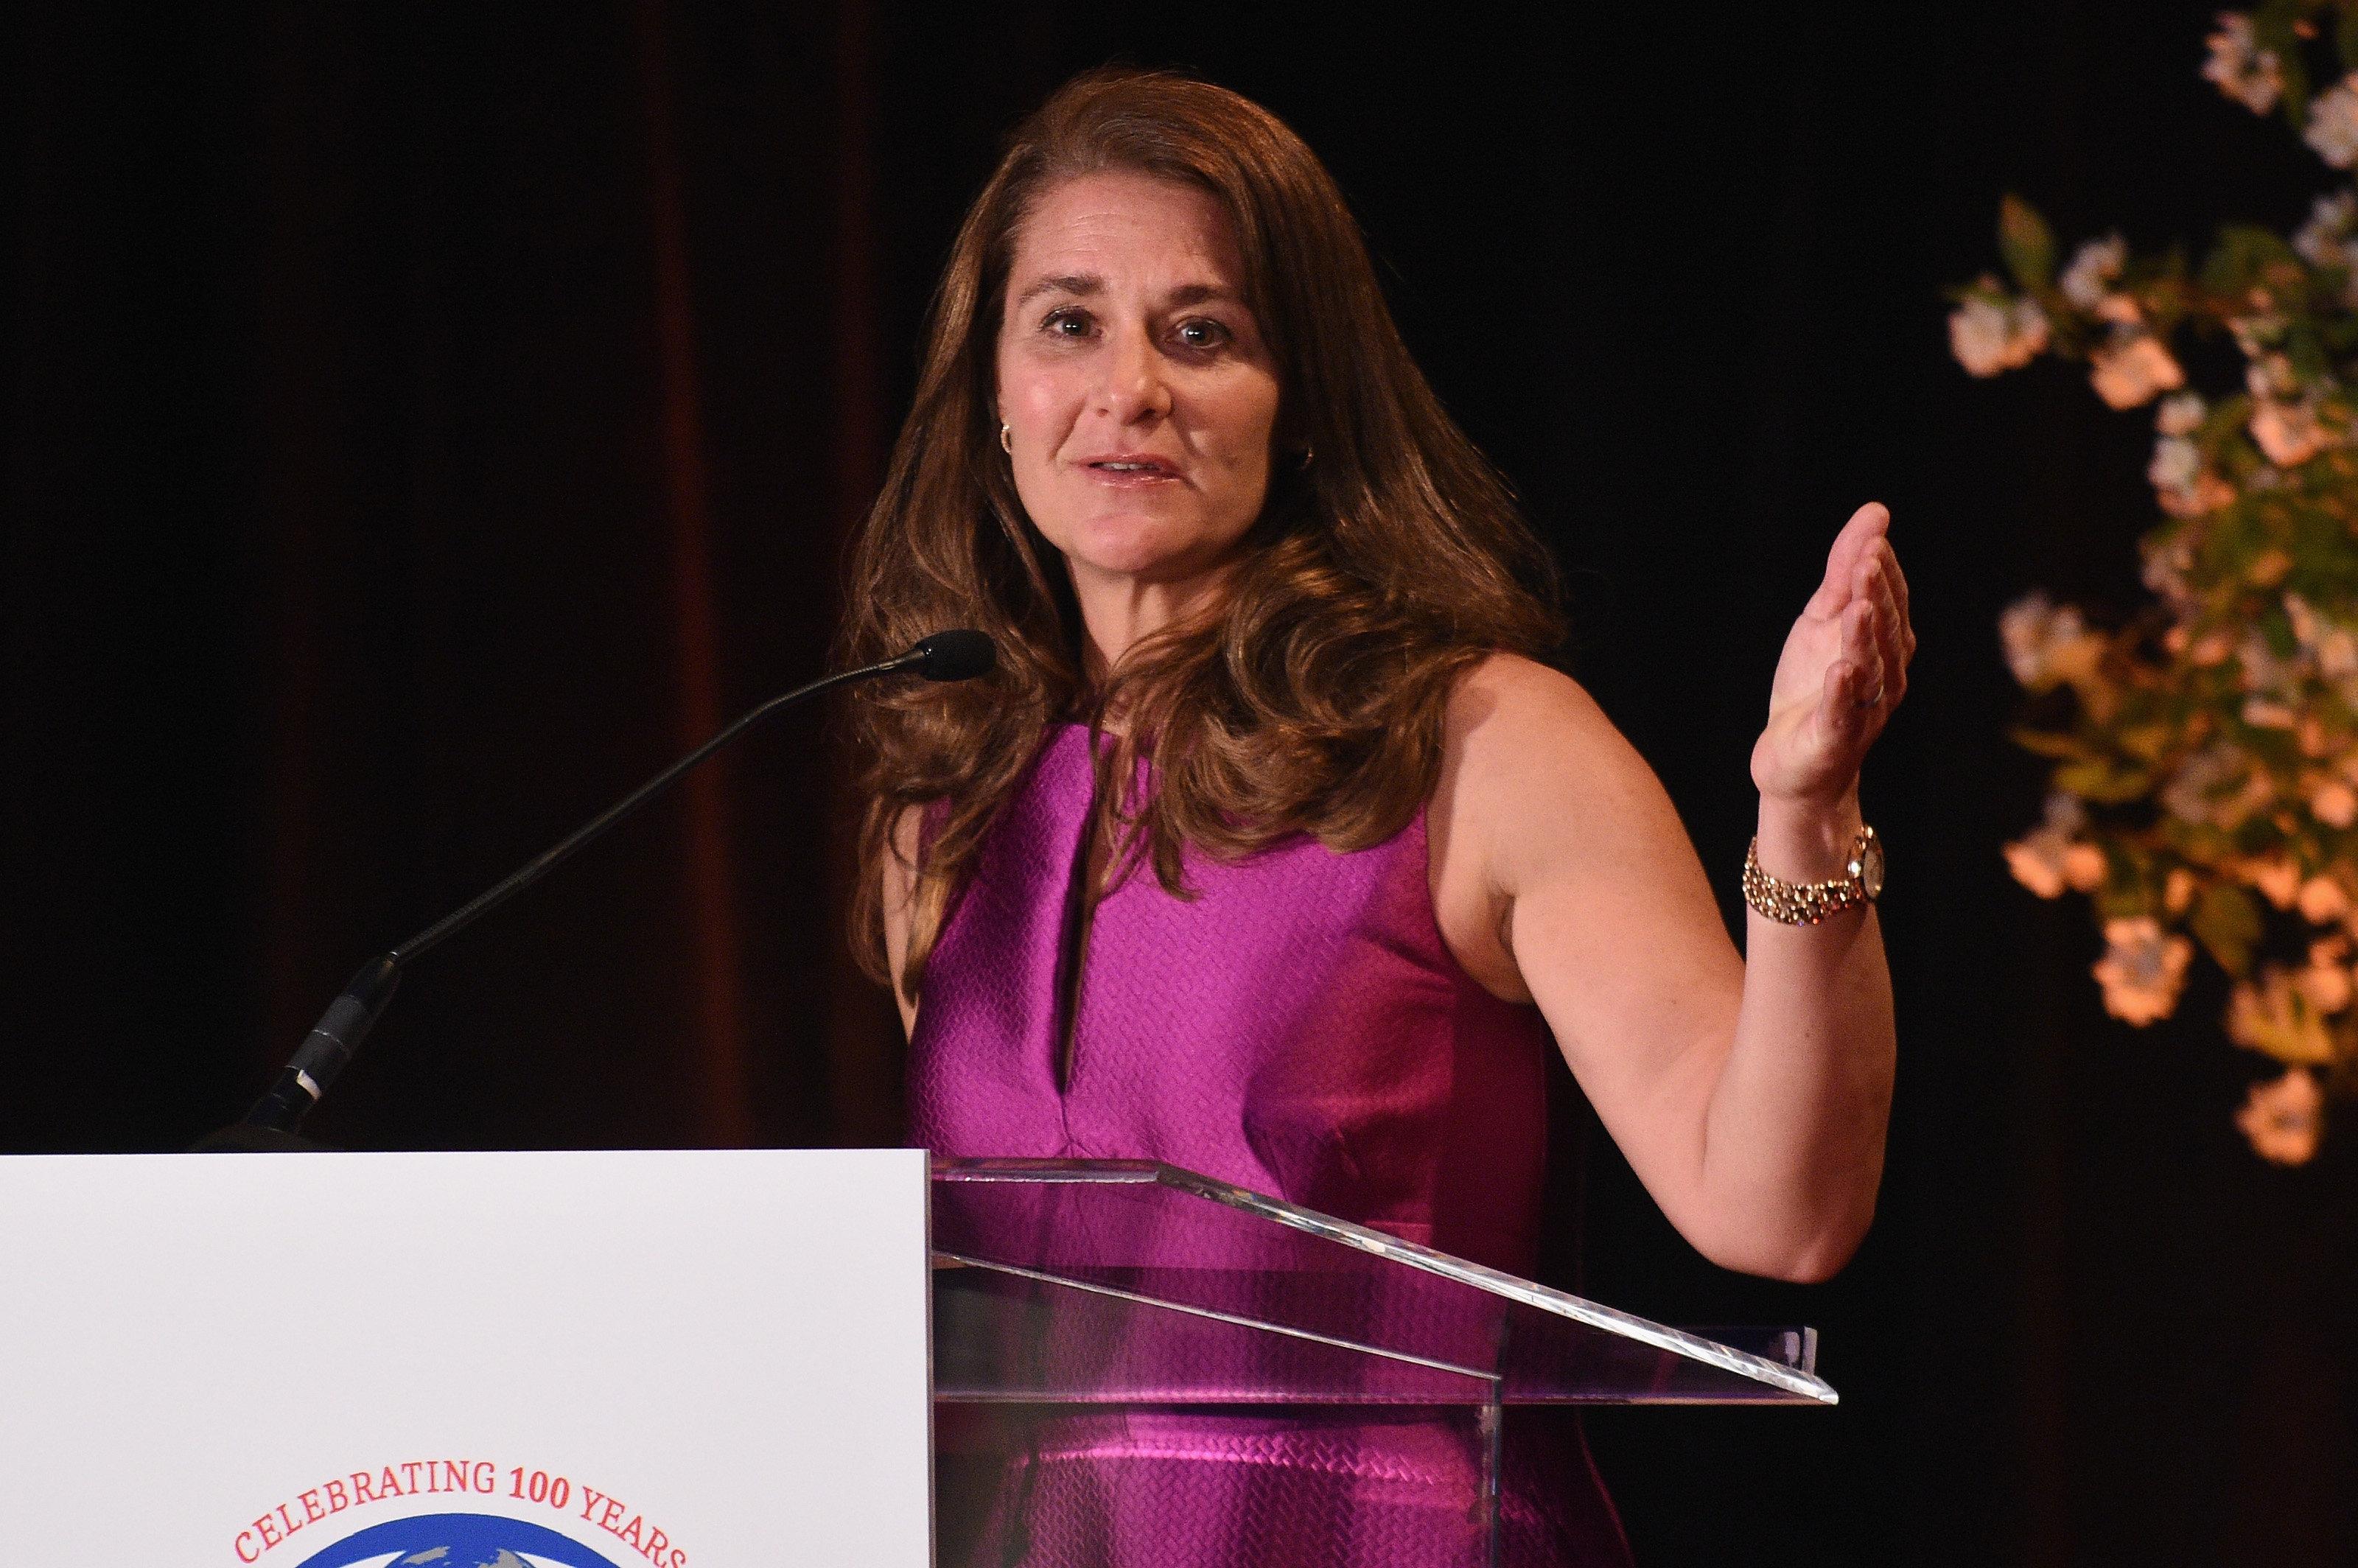 Melinda Gates wrote about breastfeeding fro Refinery29 in honor of World Breastfeeding Week.